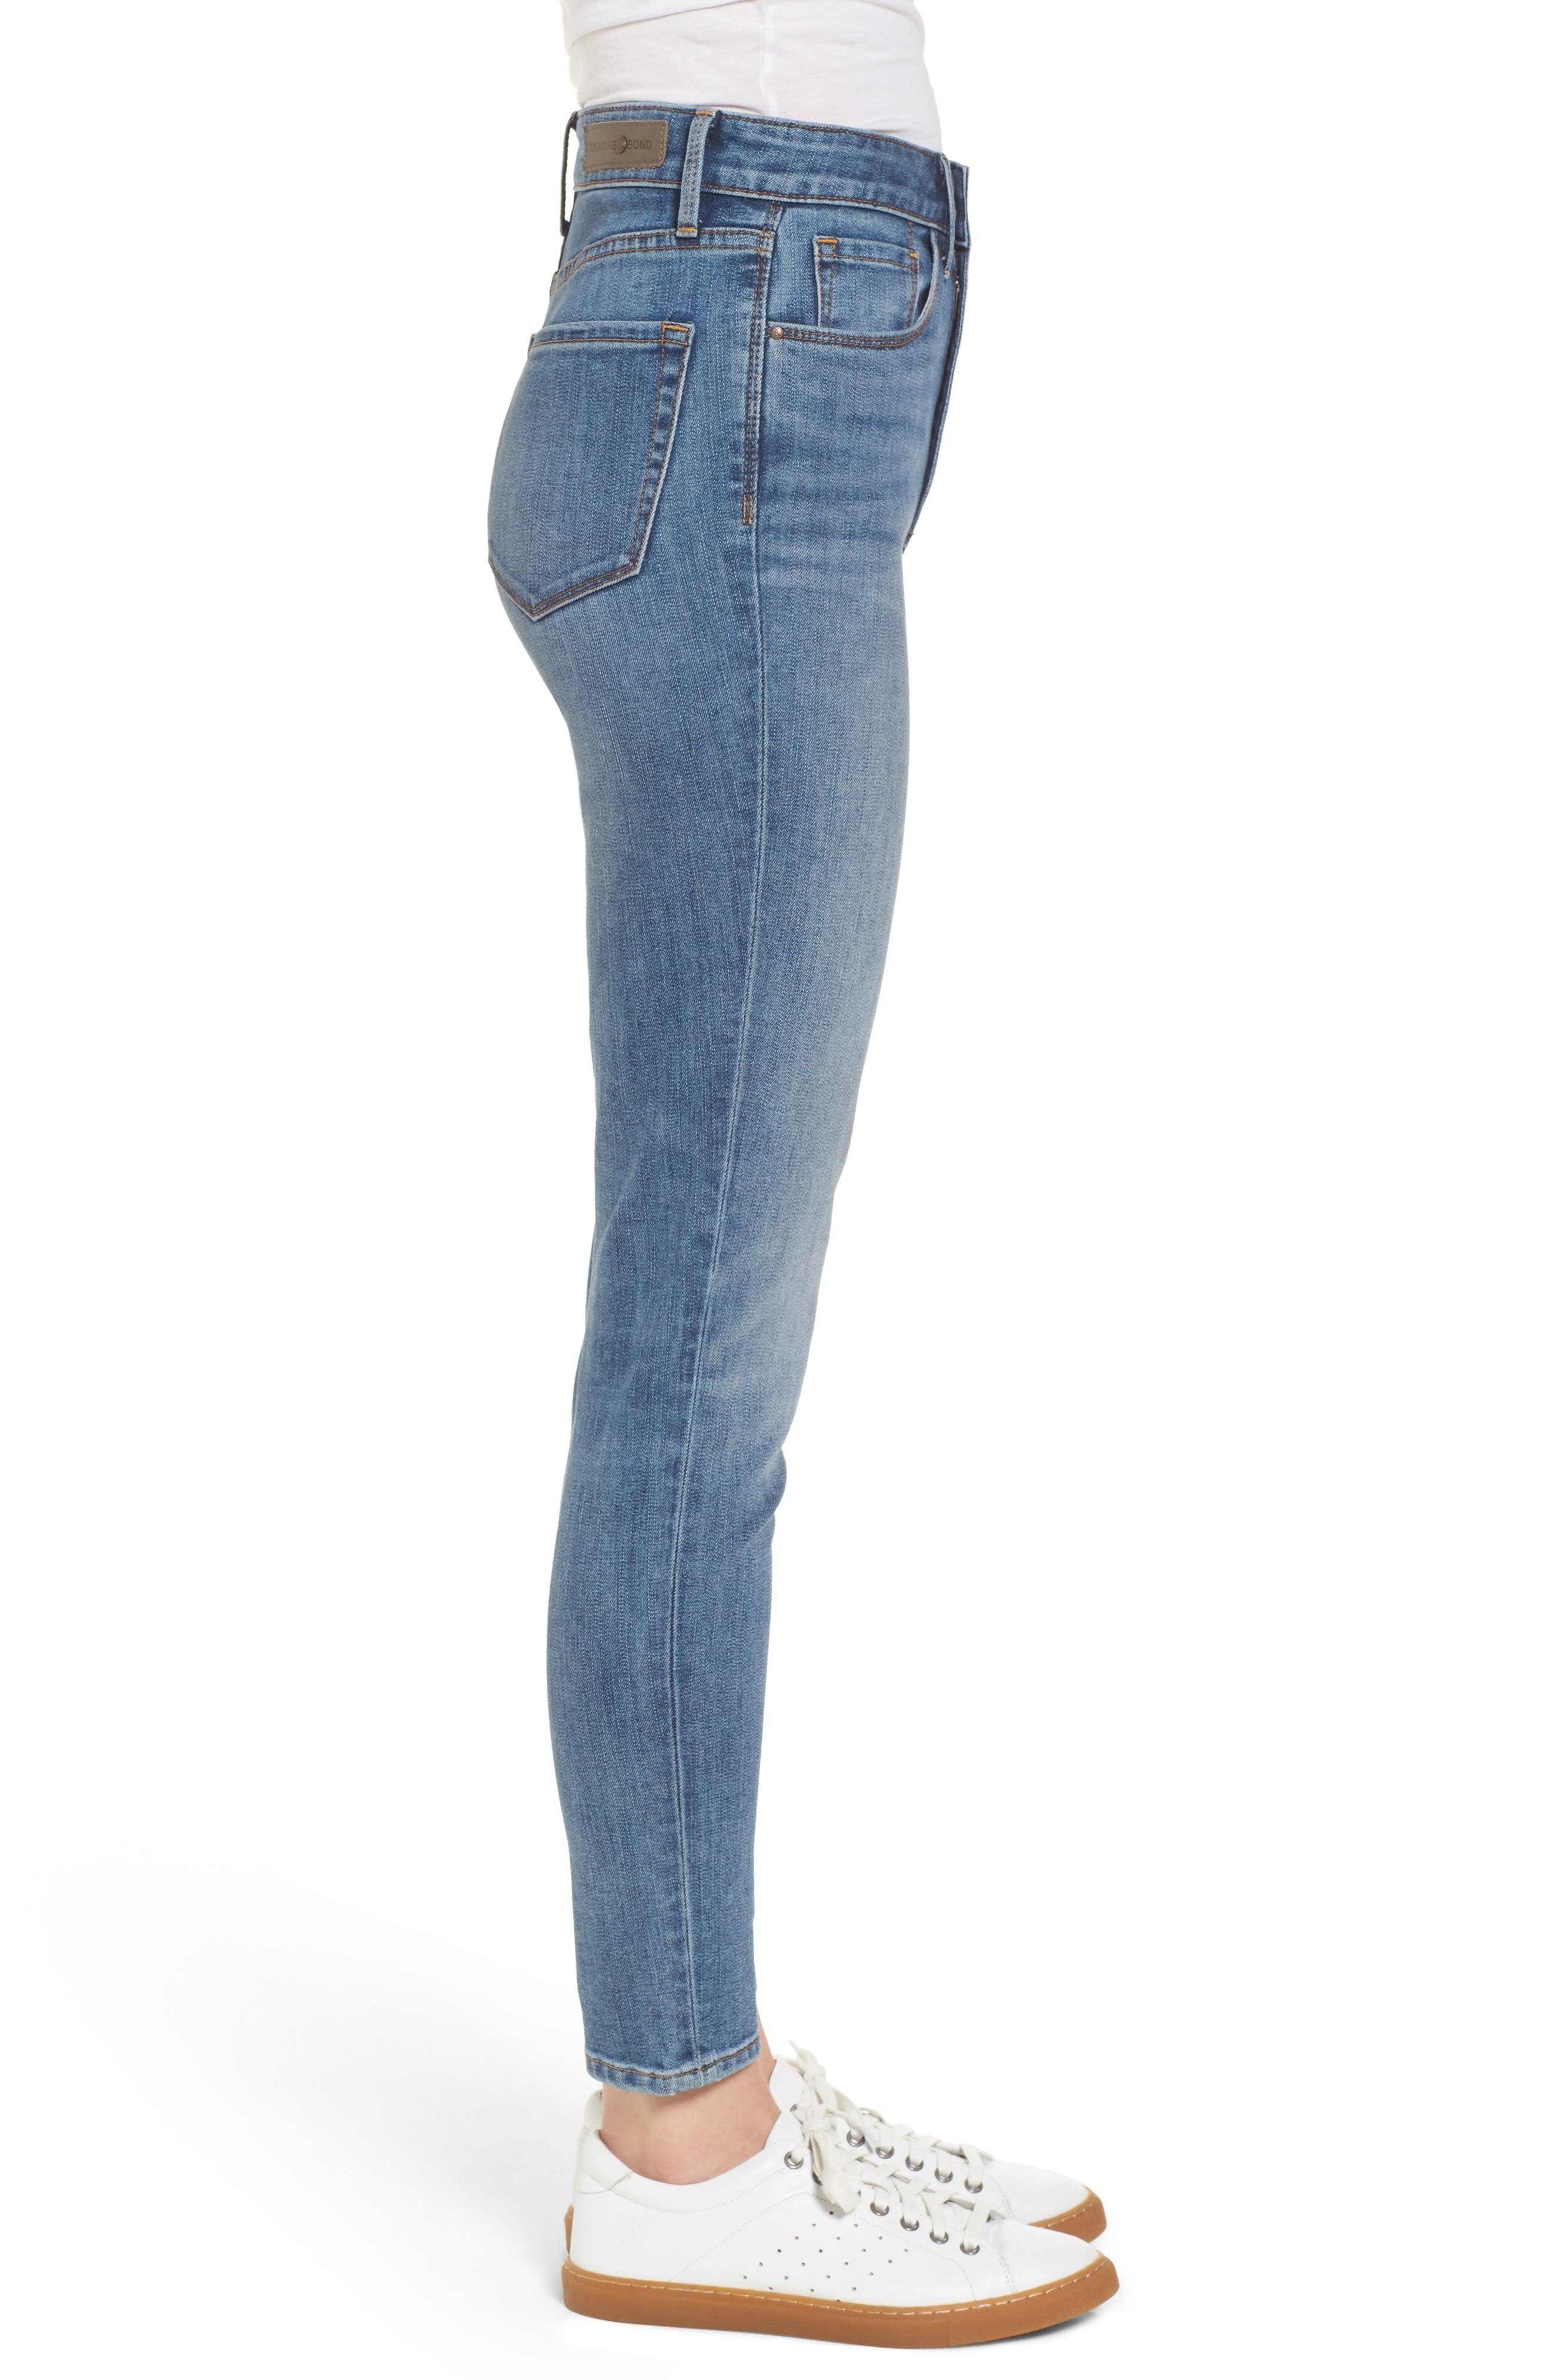 Charity High Waist Skinny Ankle Jeans,                             Alternate thumbnail 4, color,                             Rain Dusk Worn